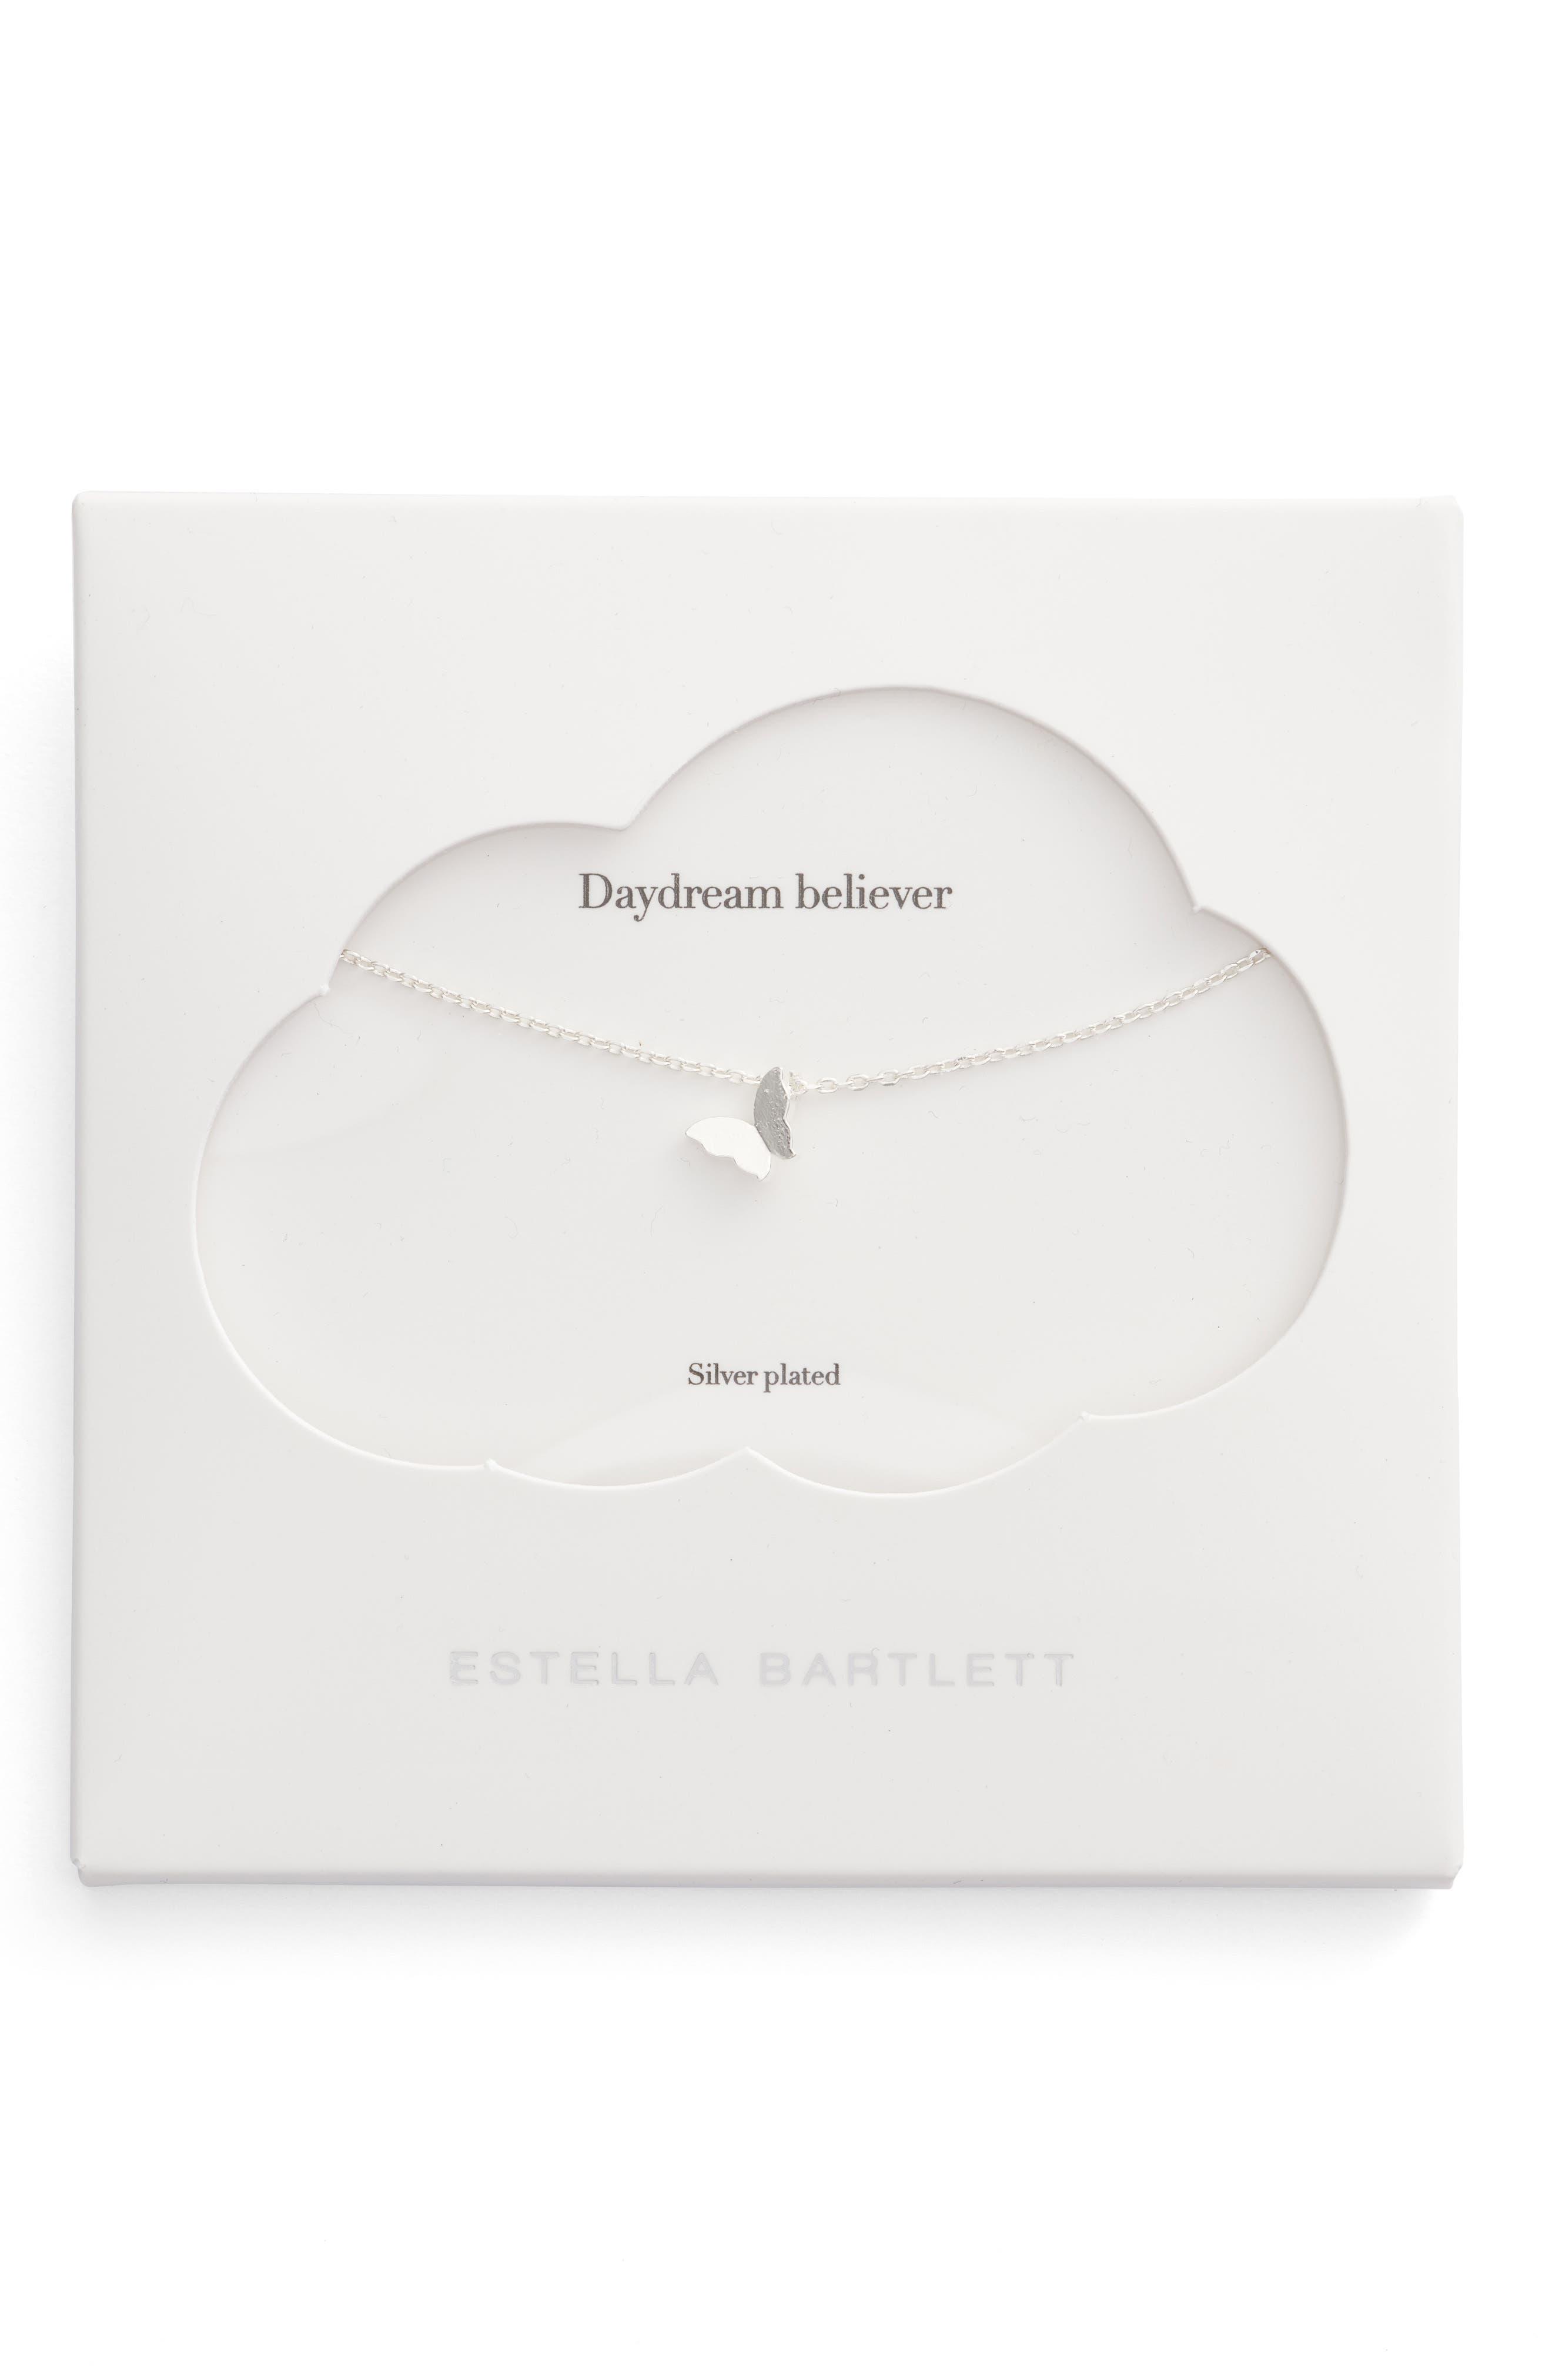 Main Image - Estella Bartlett Daydream Believers Butterfly Pendant Necklace